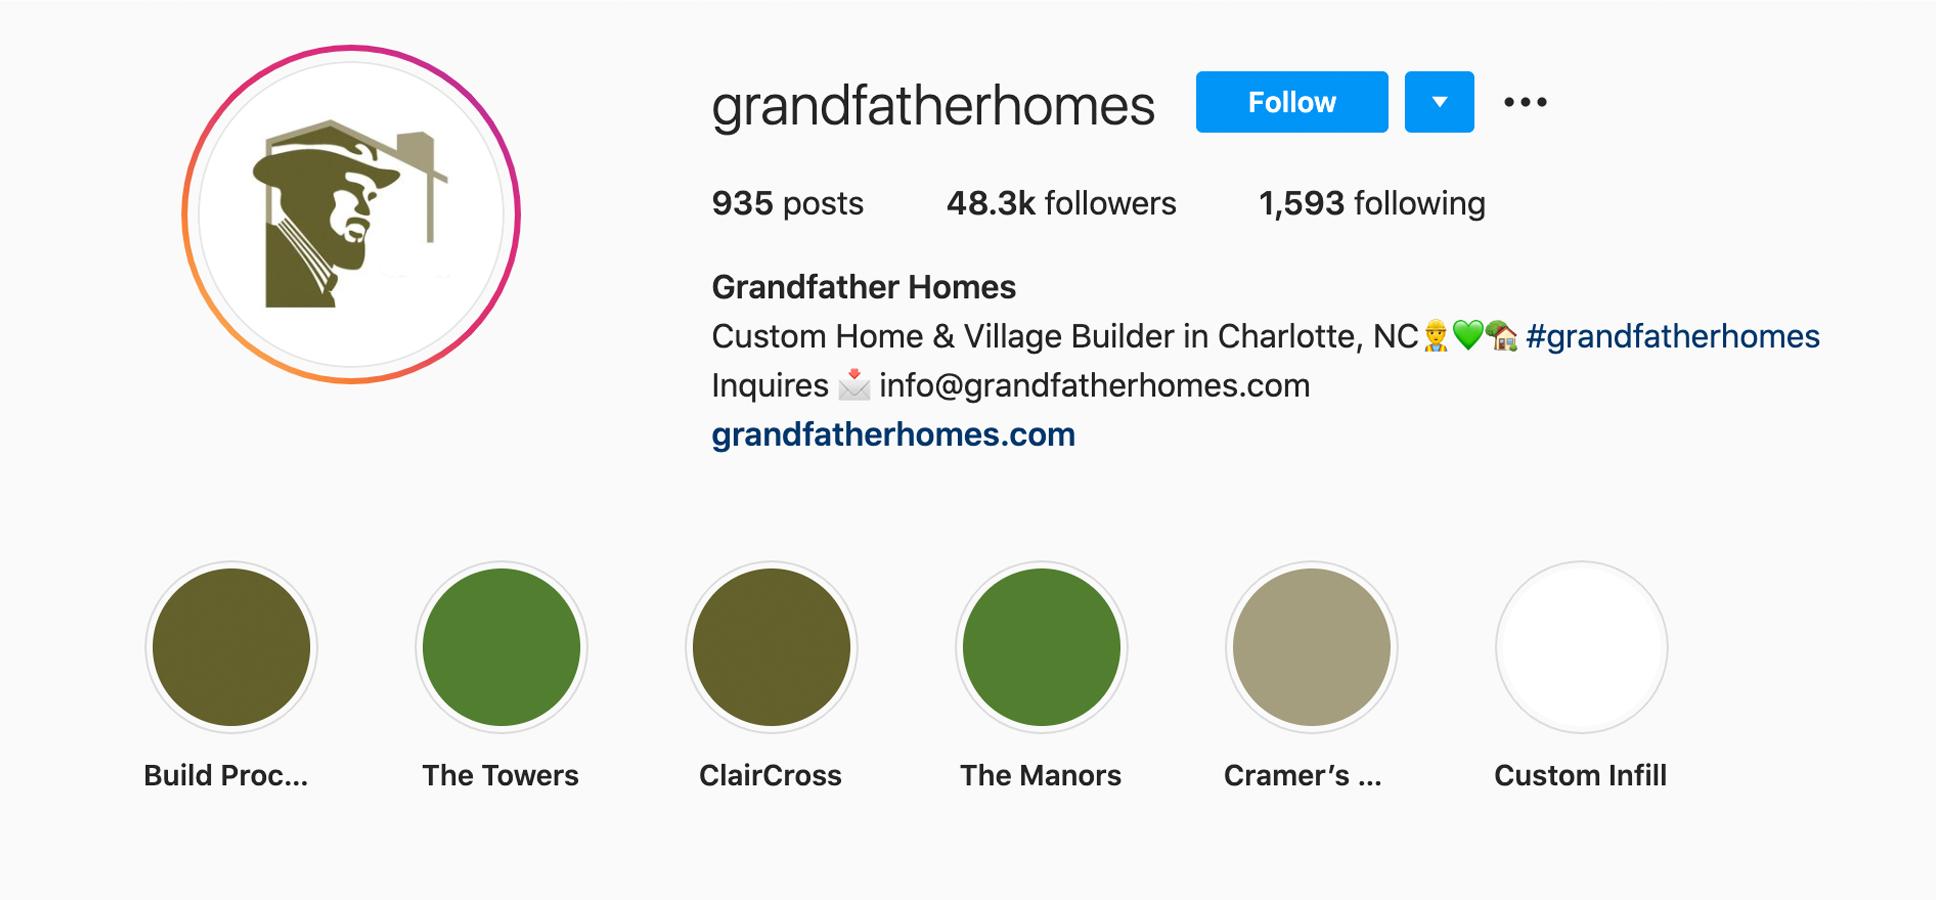 grandfatherhomes-instagram-profile